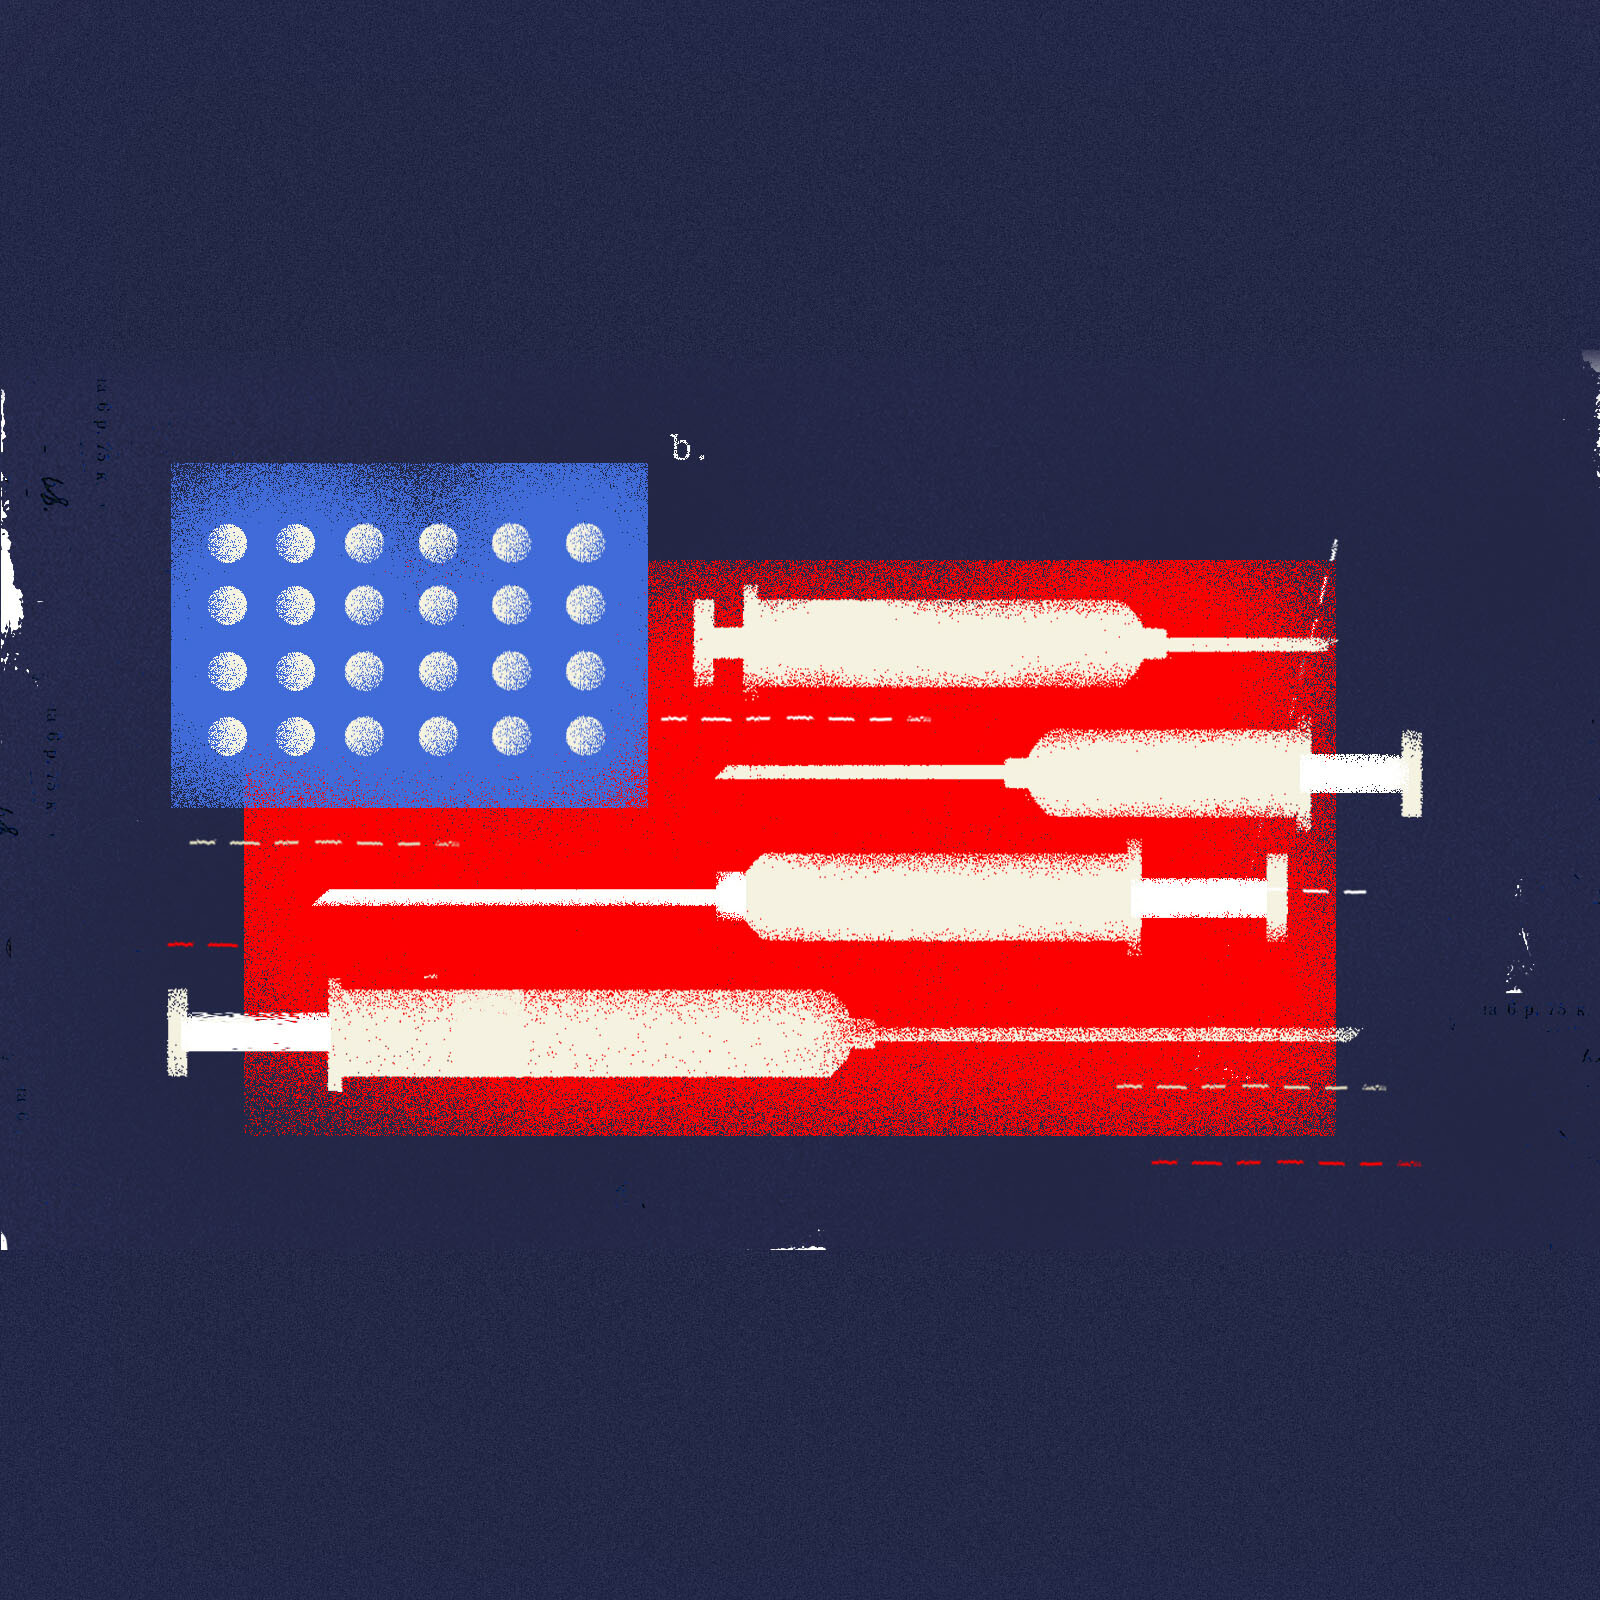 Dr. Sanjay Gupta: Taking America's pulse on its birthday